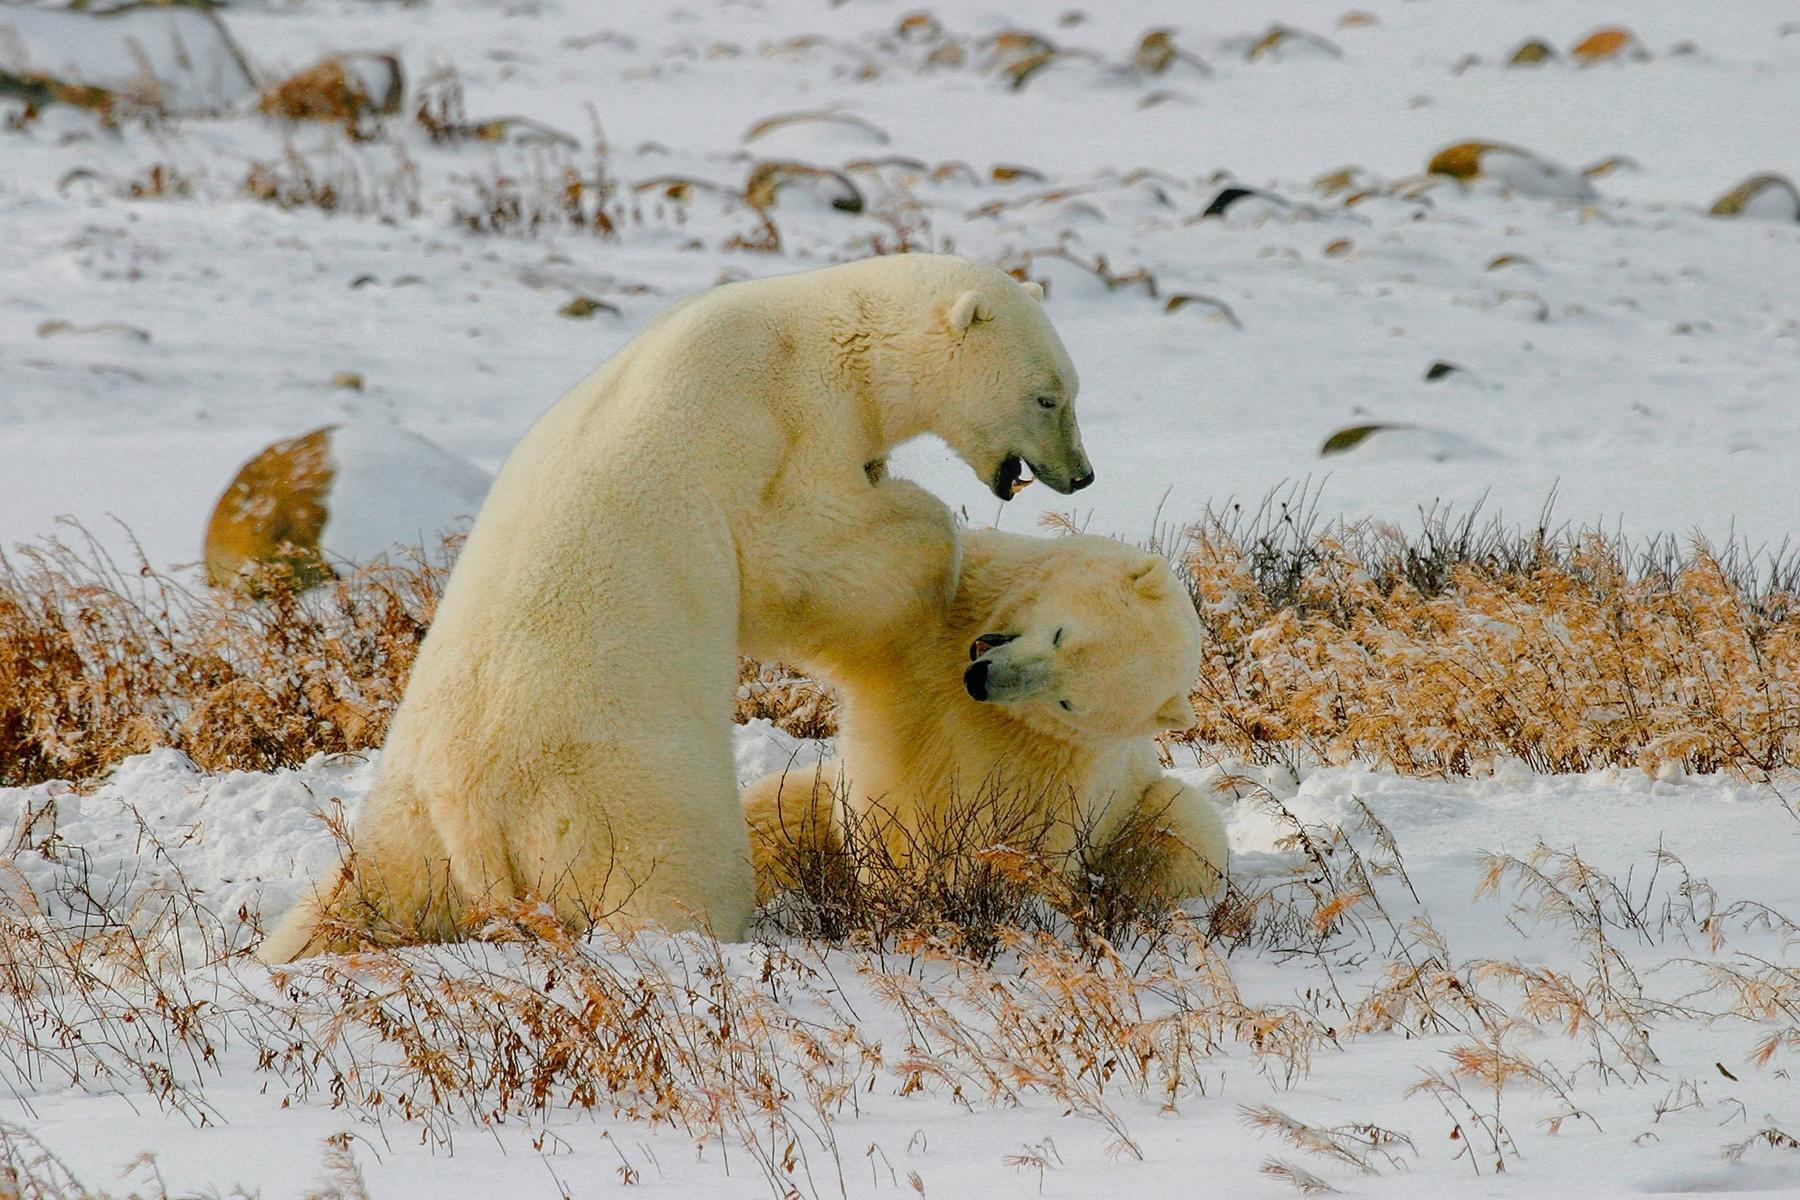 Male-polar-bears-spar-each-other-a-play-fighting.-Near-Chur-NM-Best-in-Show-by-Shinnan-Kiang-LV